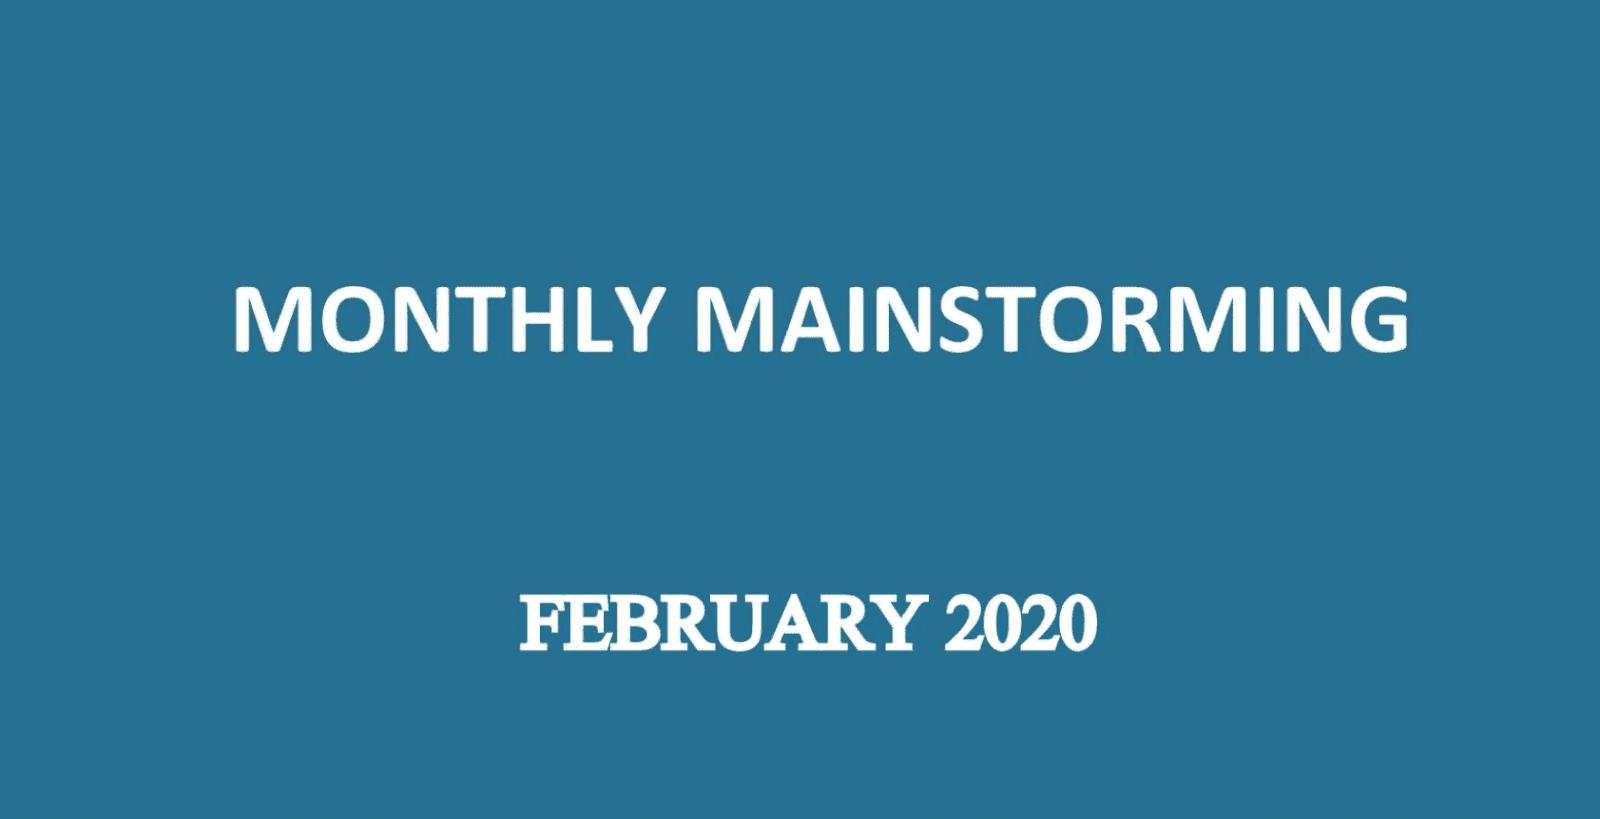 UPSC Mainstorming February 2020